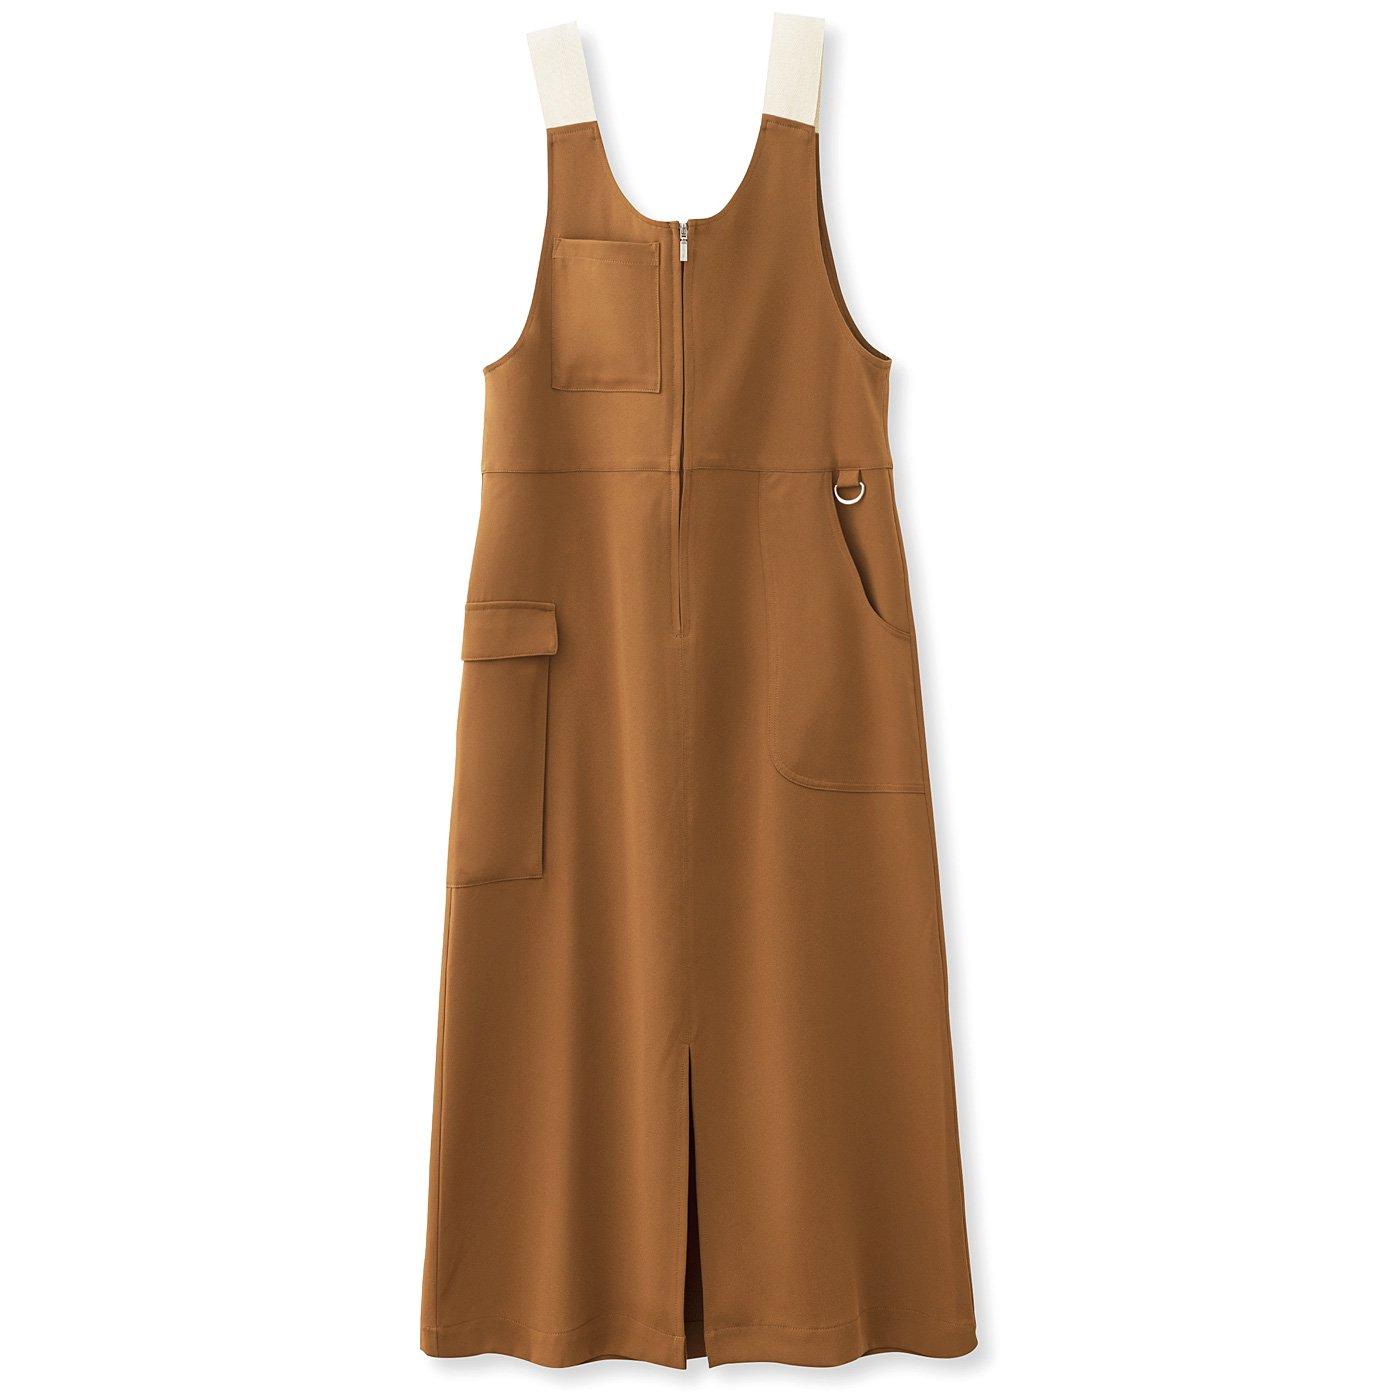 UP.de 着られるバッグで身軽にお出かけ 手ぶらがうれしいポケットいっぱい サロペットスカートの会